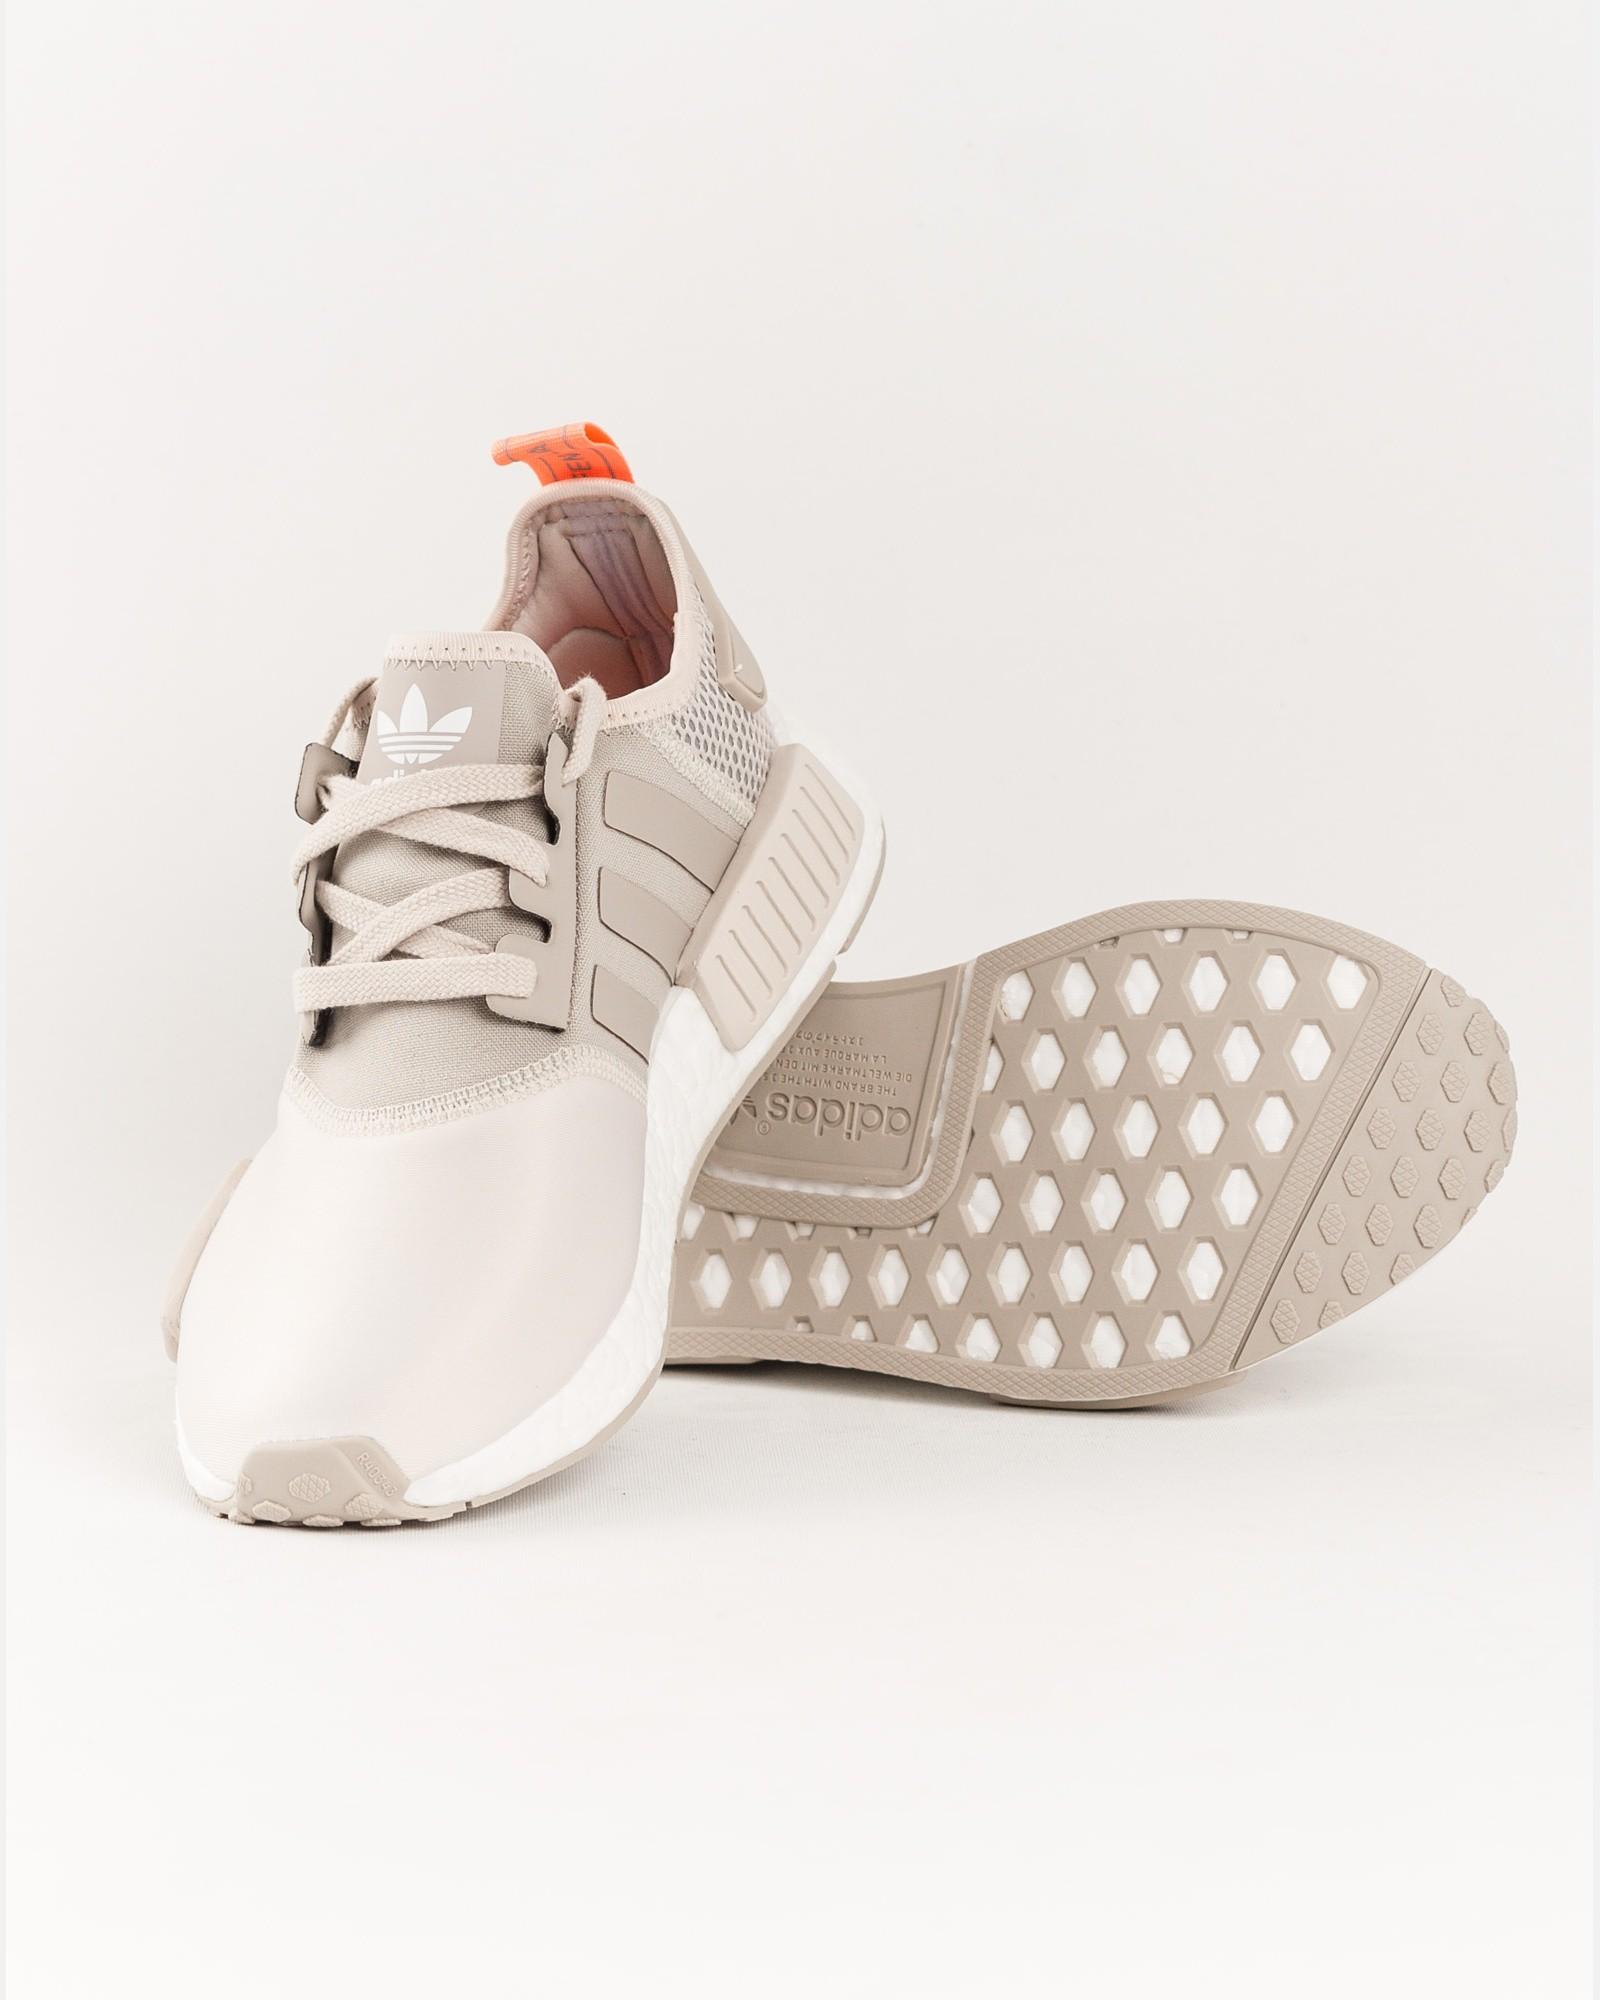 adidas nmd r1 femme grise et rose